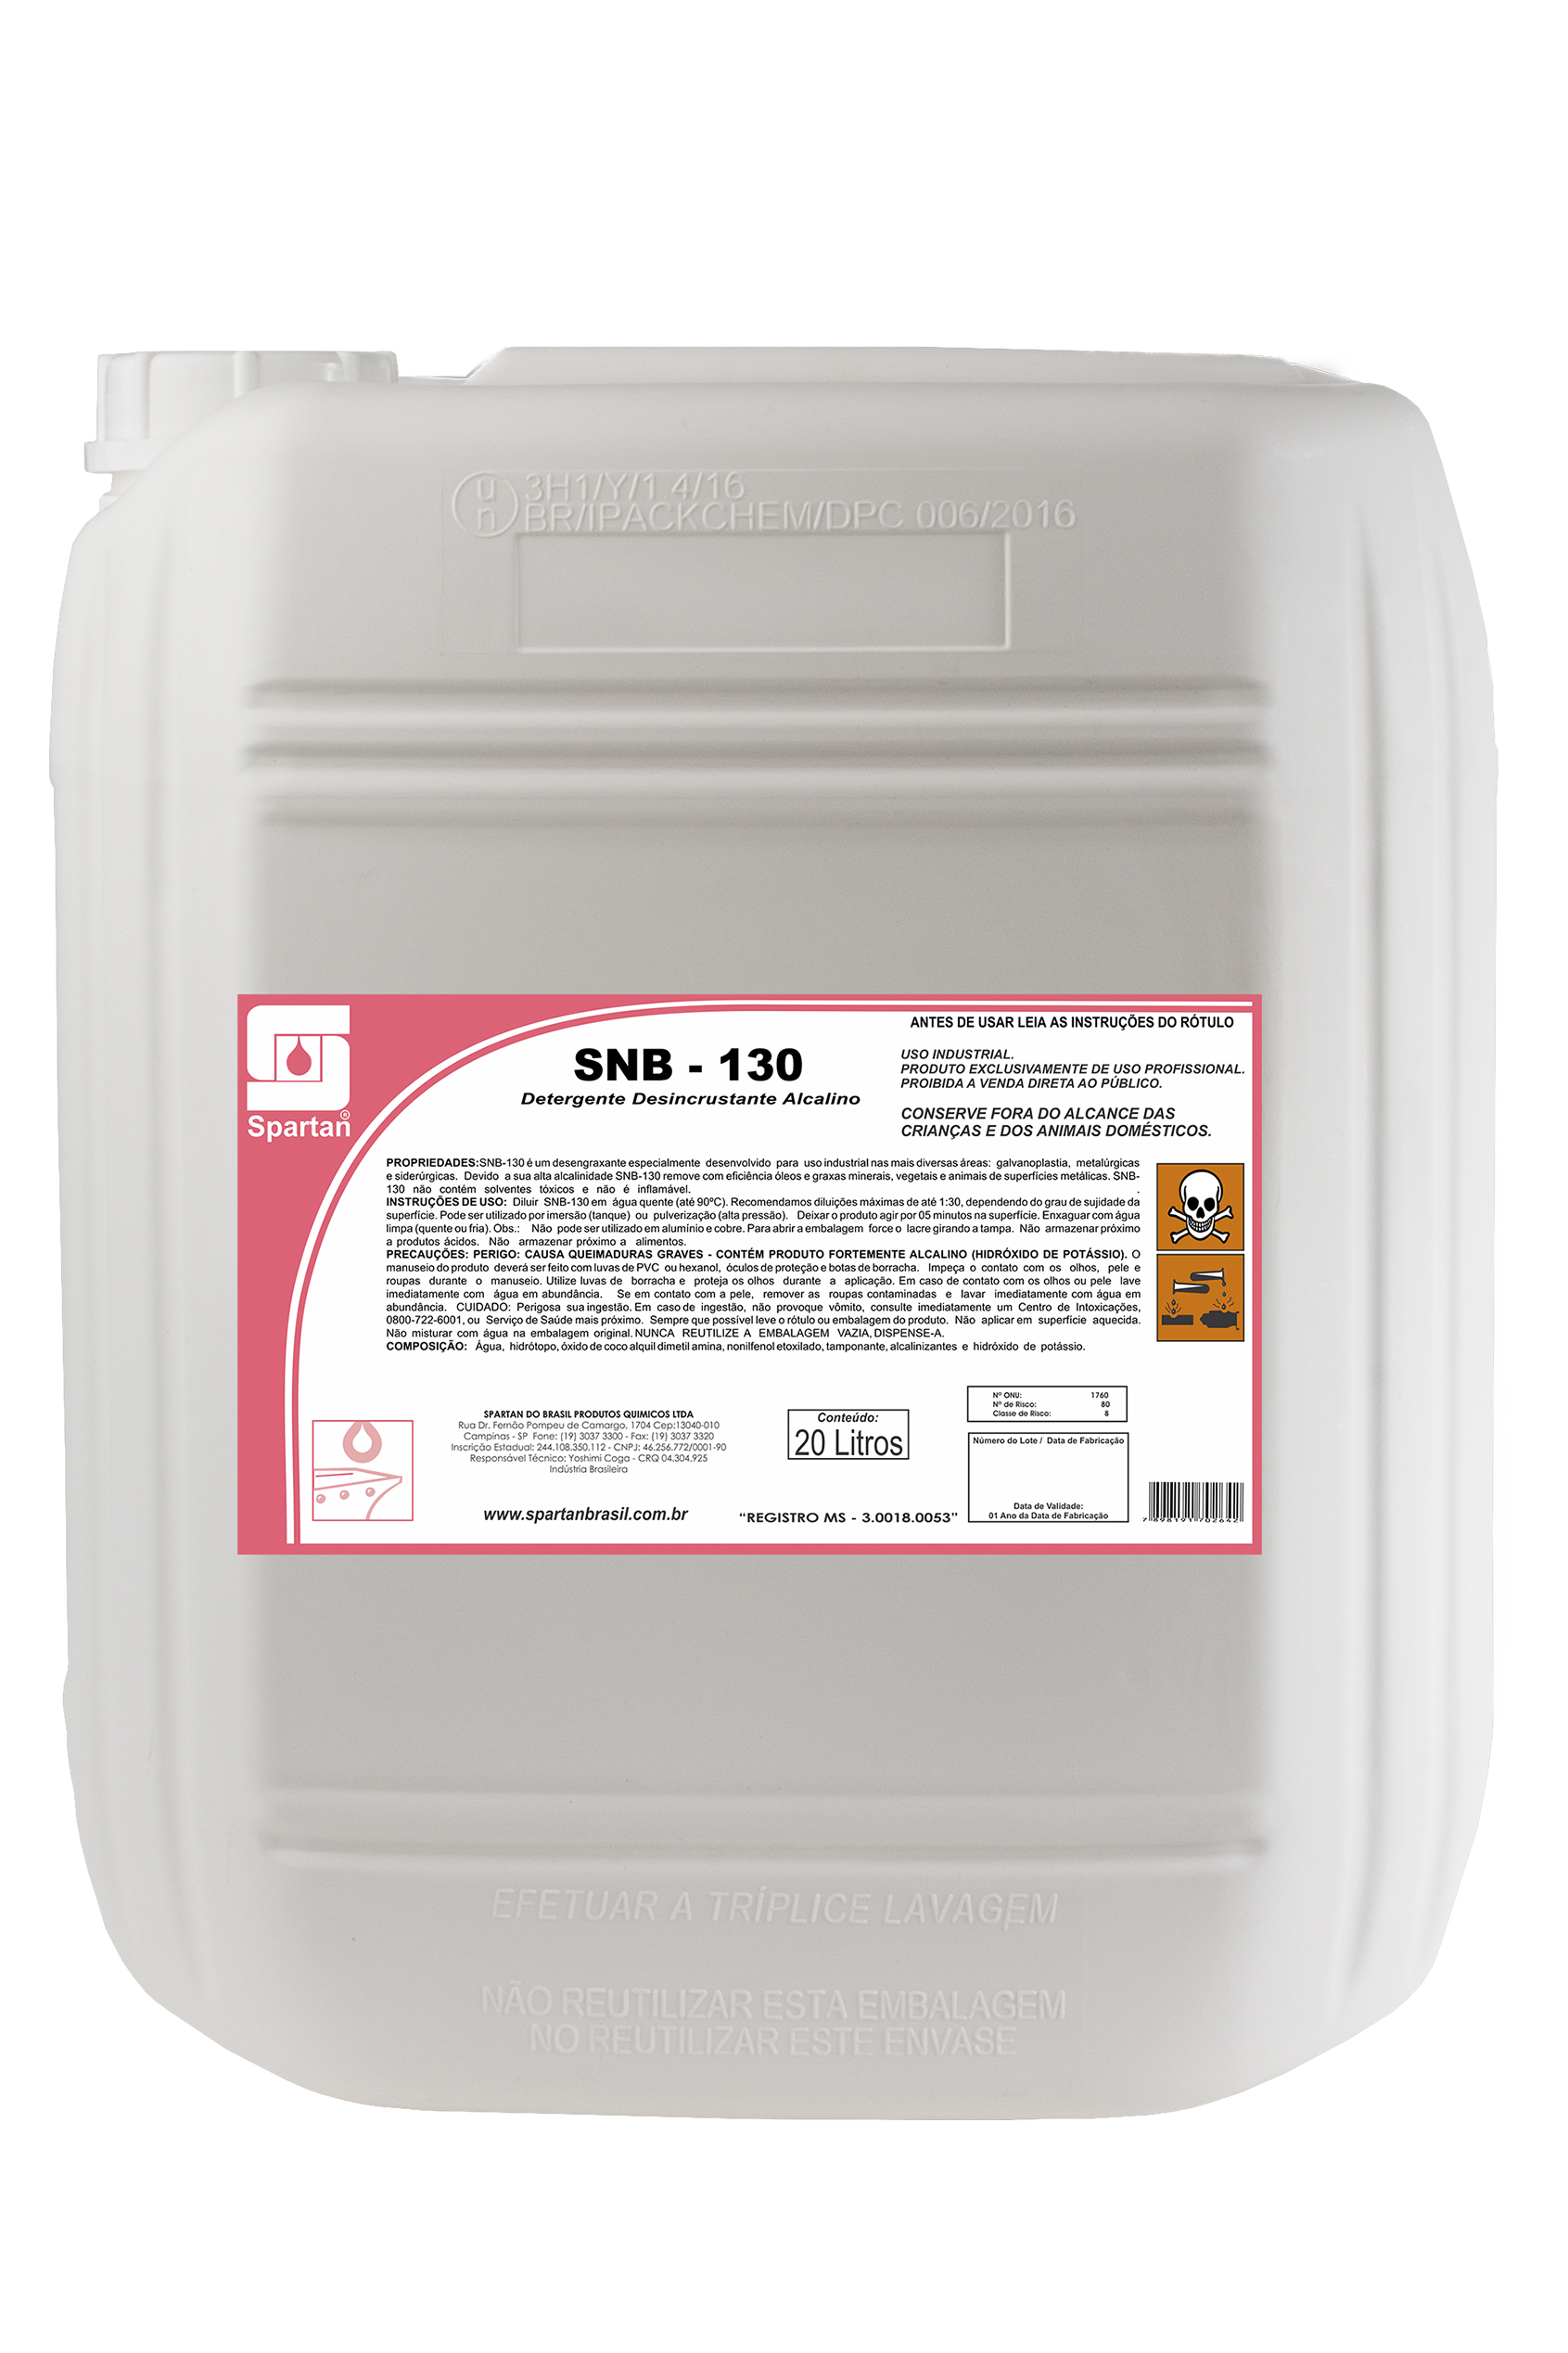 Imagem ilustrativa do produto: SNB-130